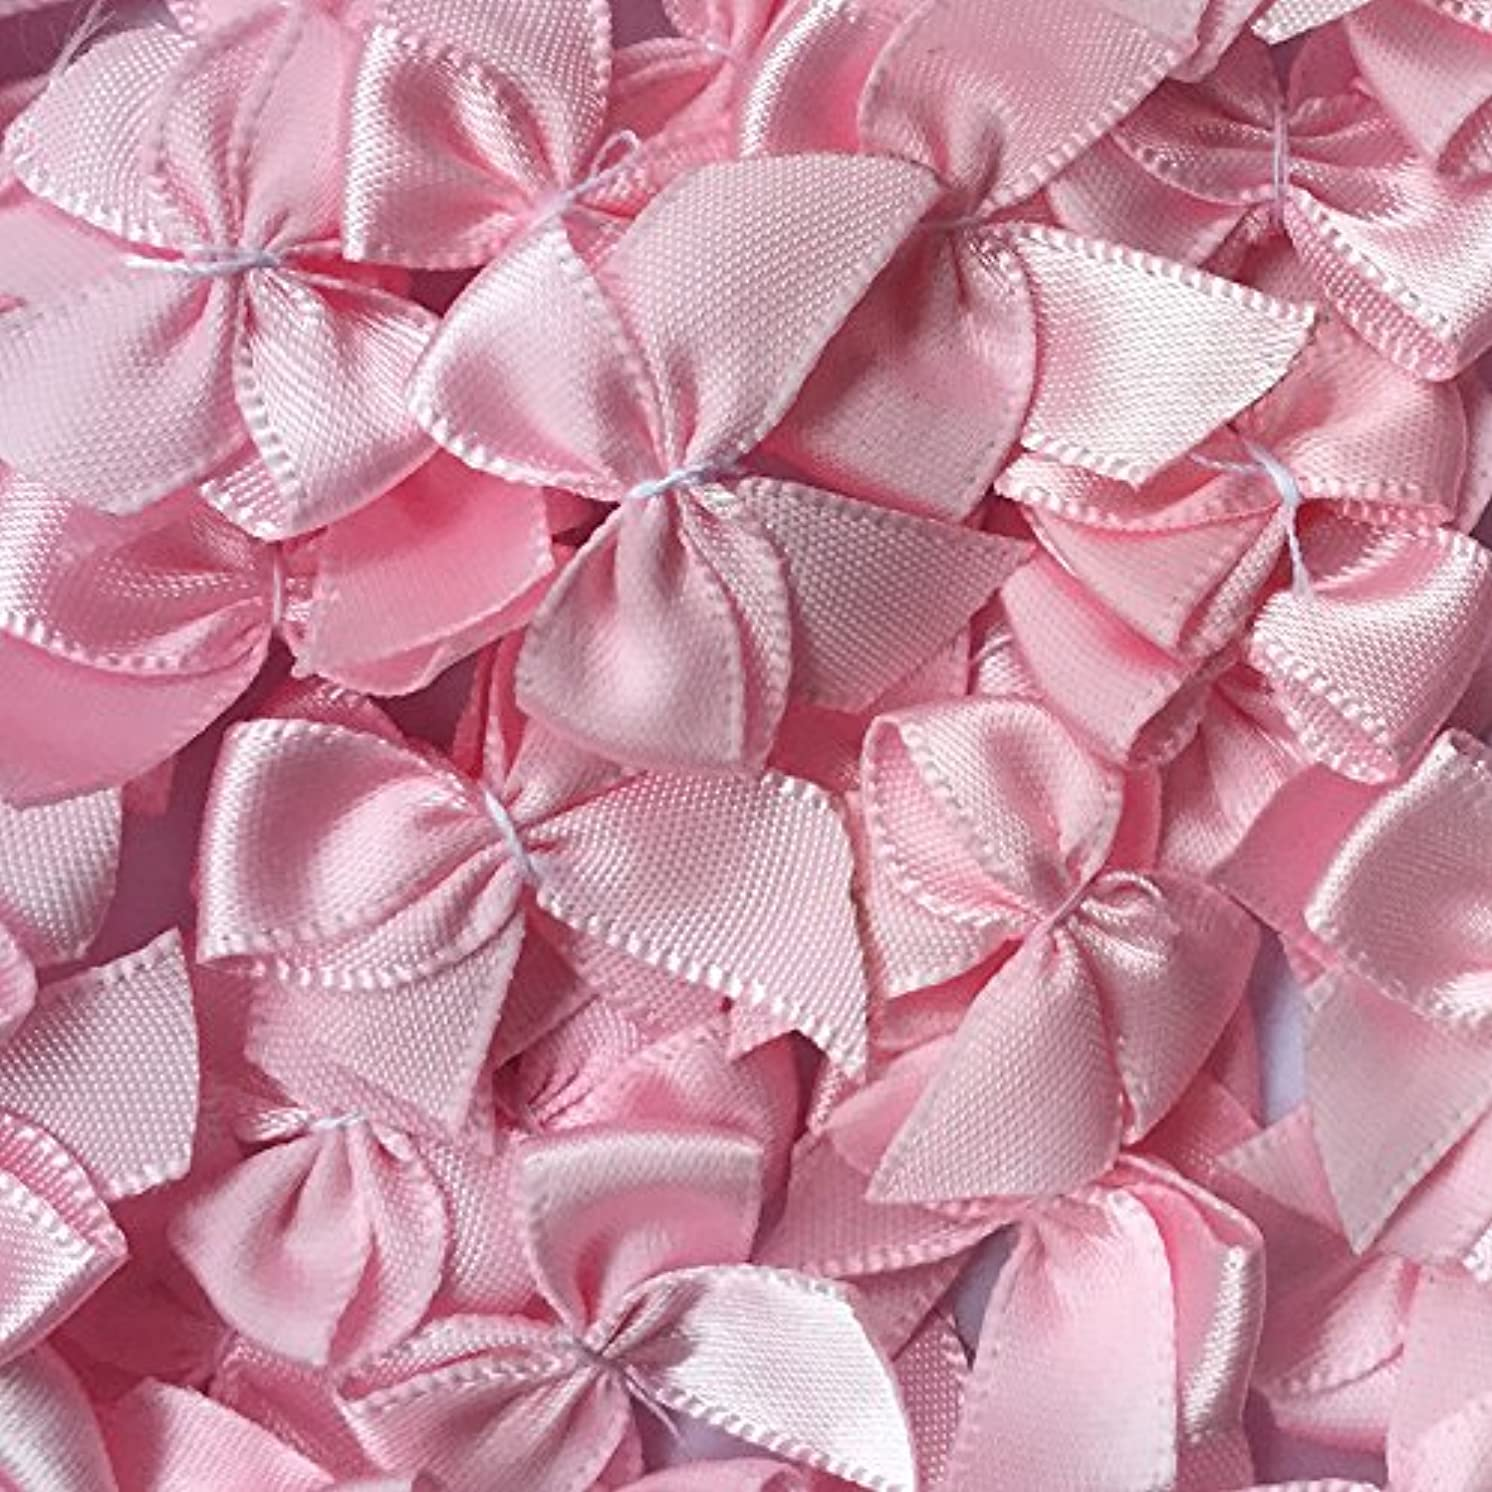 Chenkou Craft 60pcs Mini Satin Ribbon Bows Flowers 1